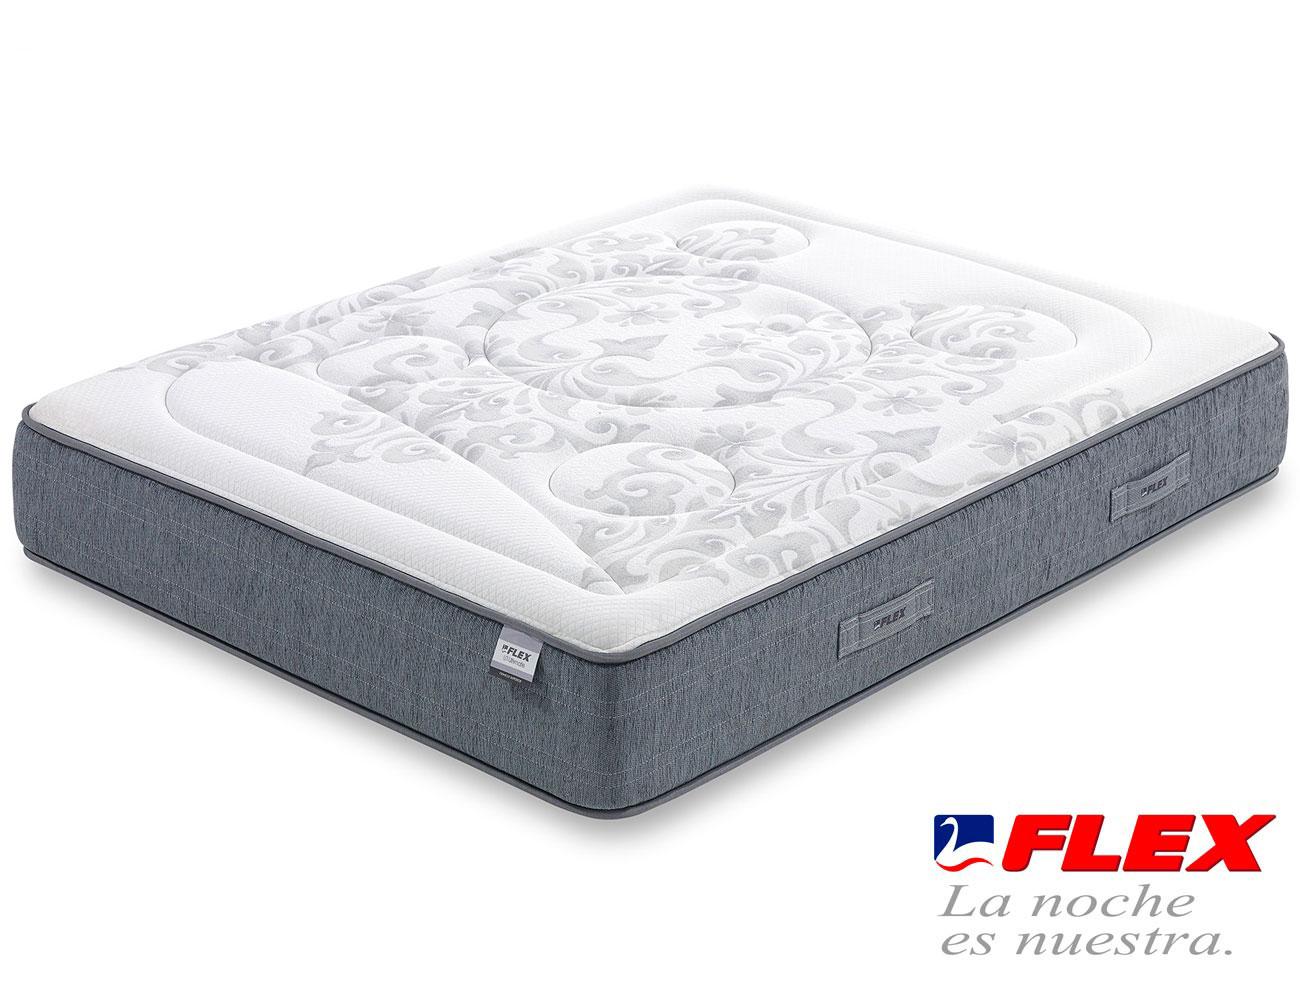 Colchon flex airvex viscoelastica gel garbi superior16